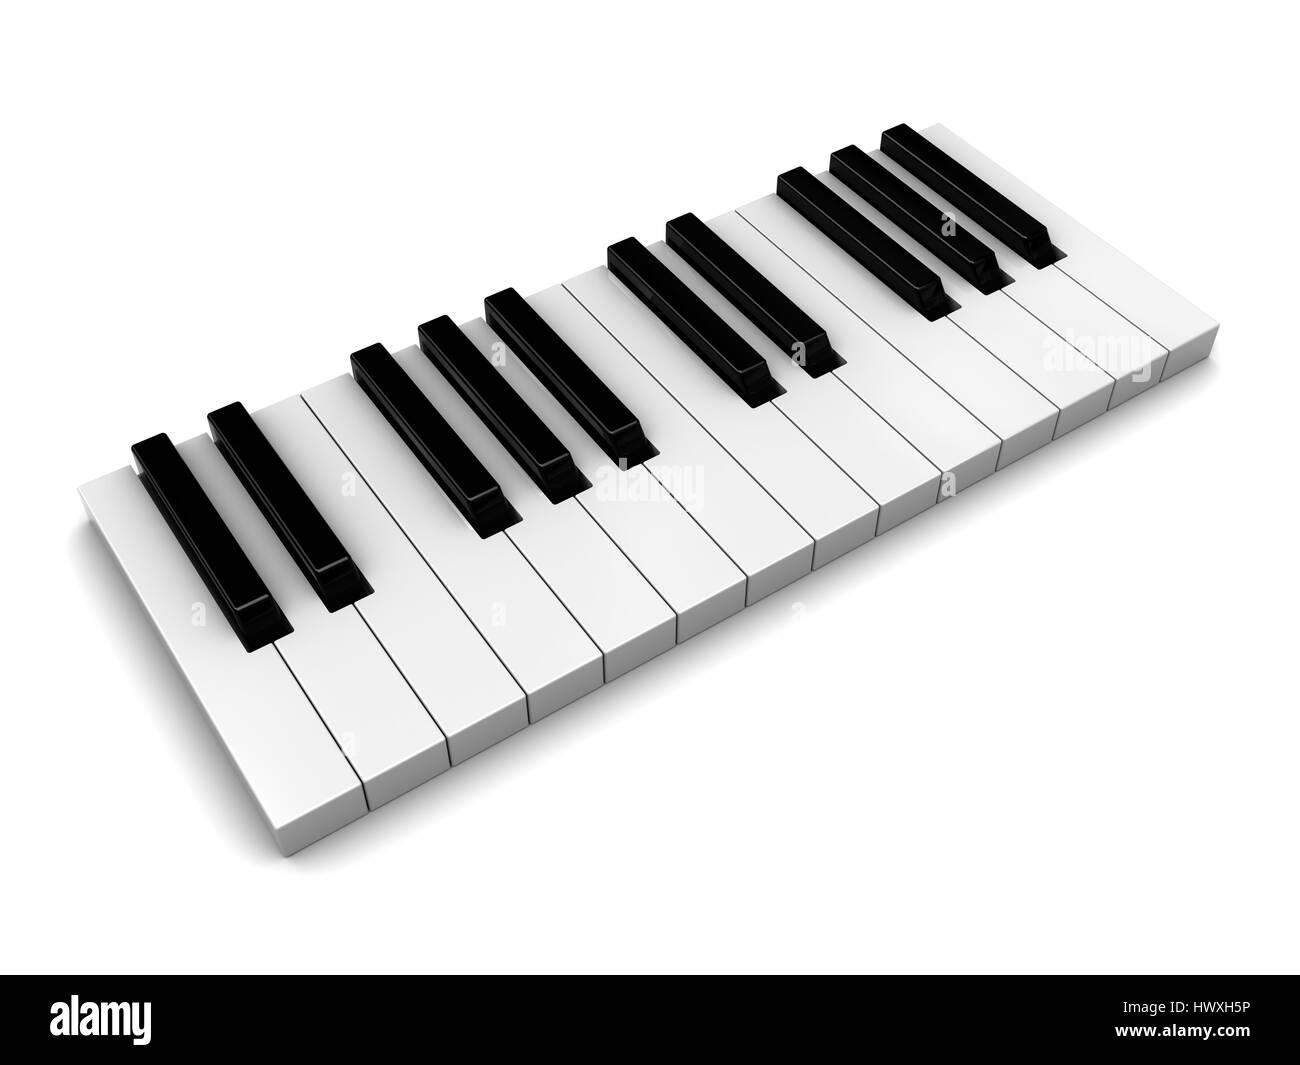 3d illustration of piaon keys over white background - Stock Image